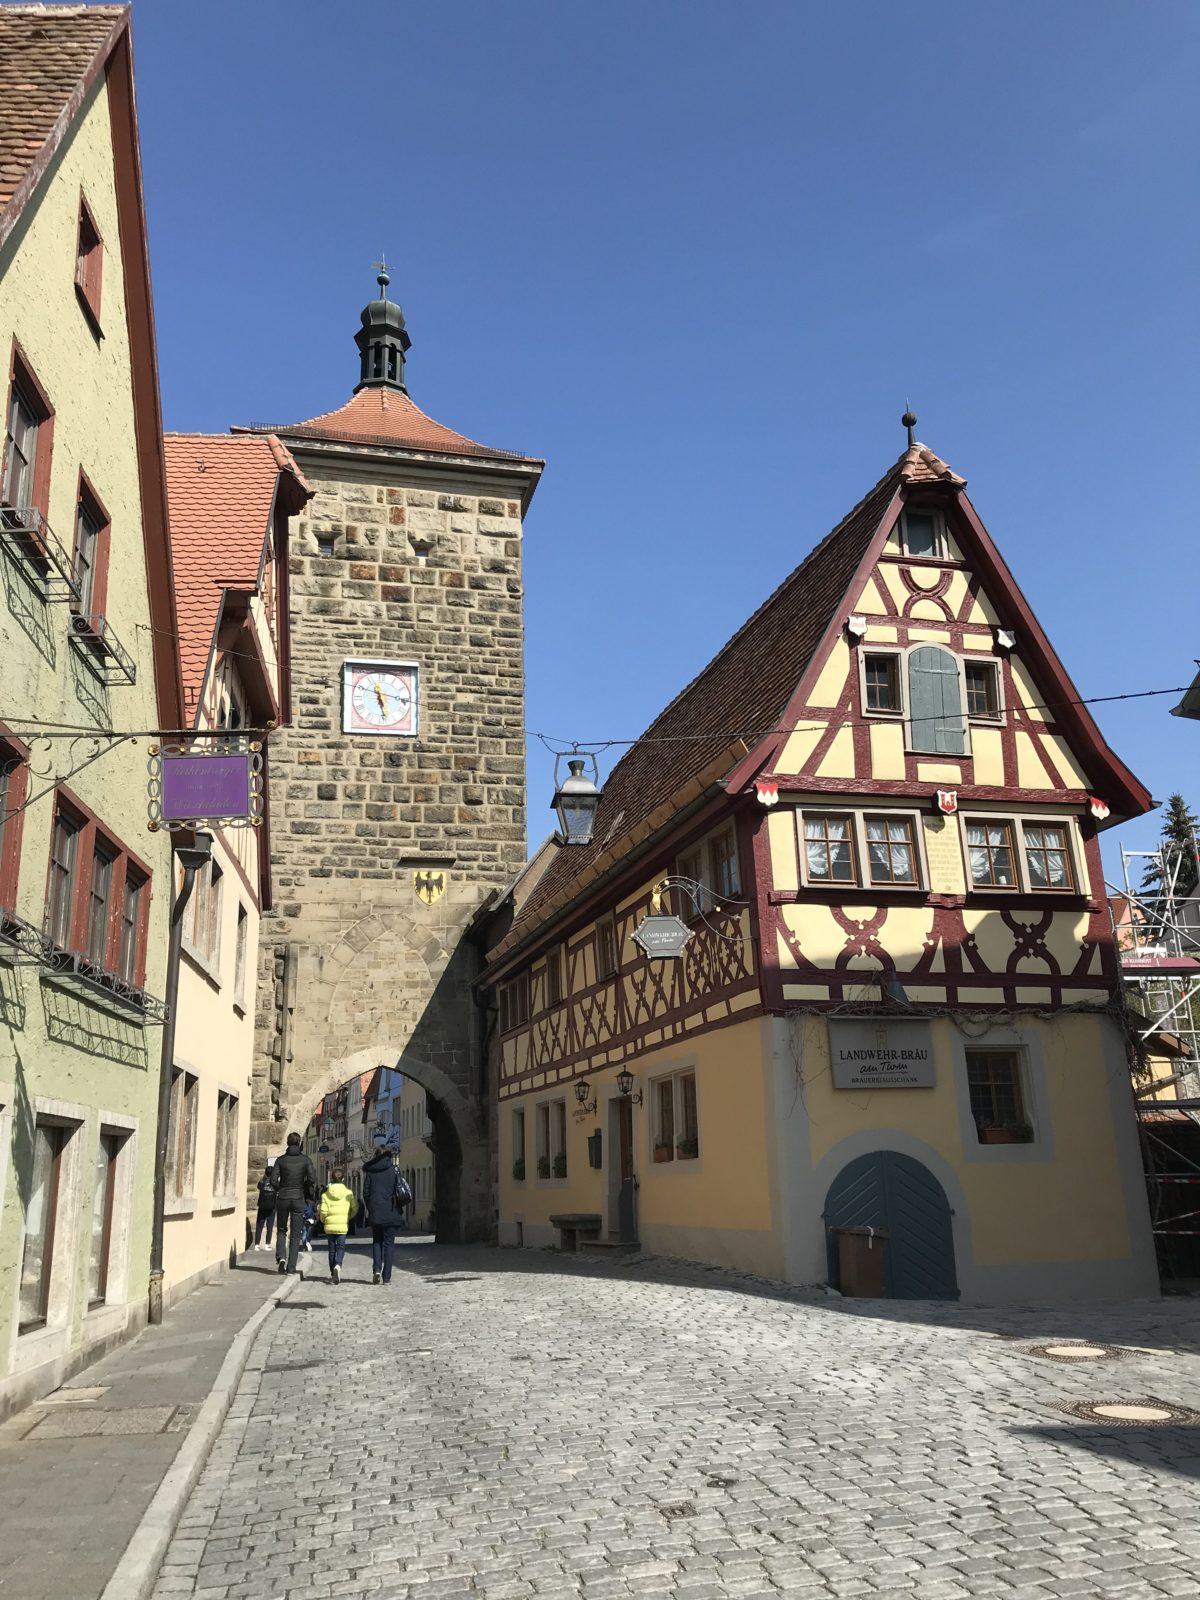 Übernachtung in Rothenburg o.d.T.